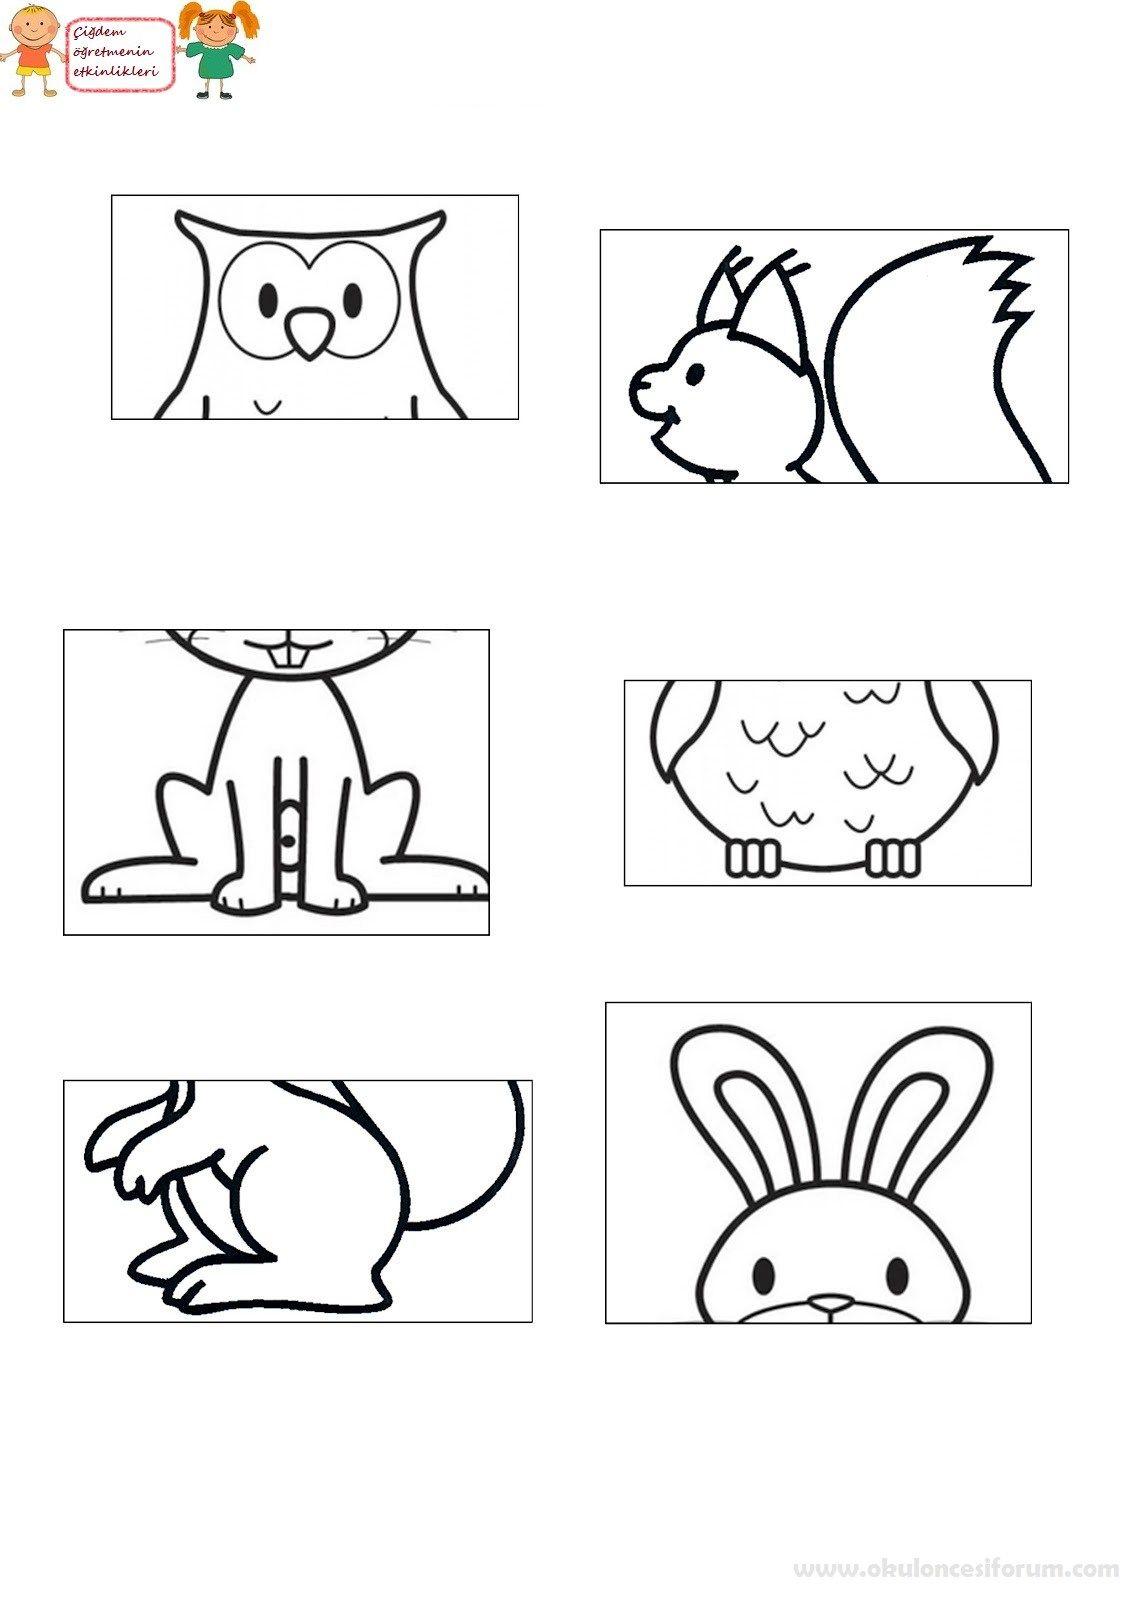 Hayvanlarin Yarisini Bulma Oyunlari Okul Oncesi Boyama